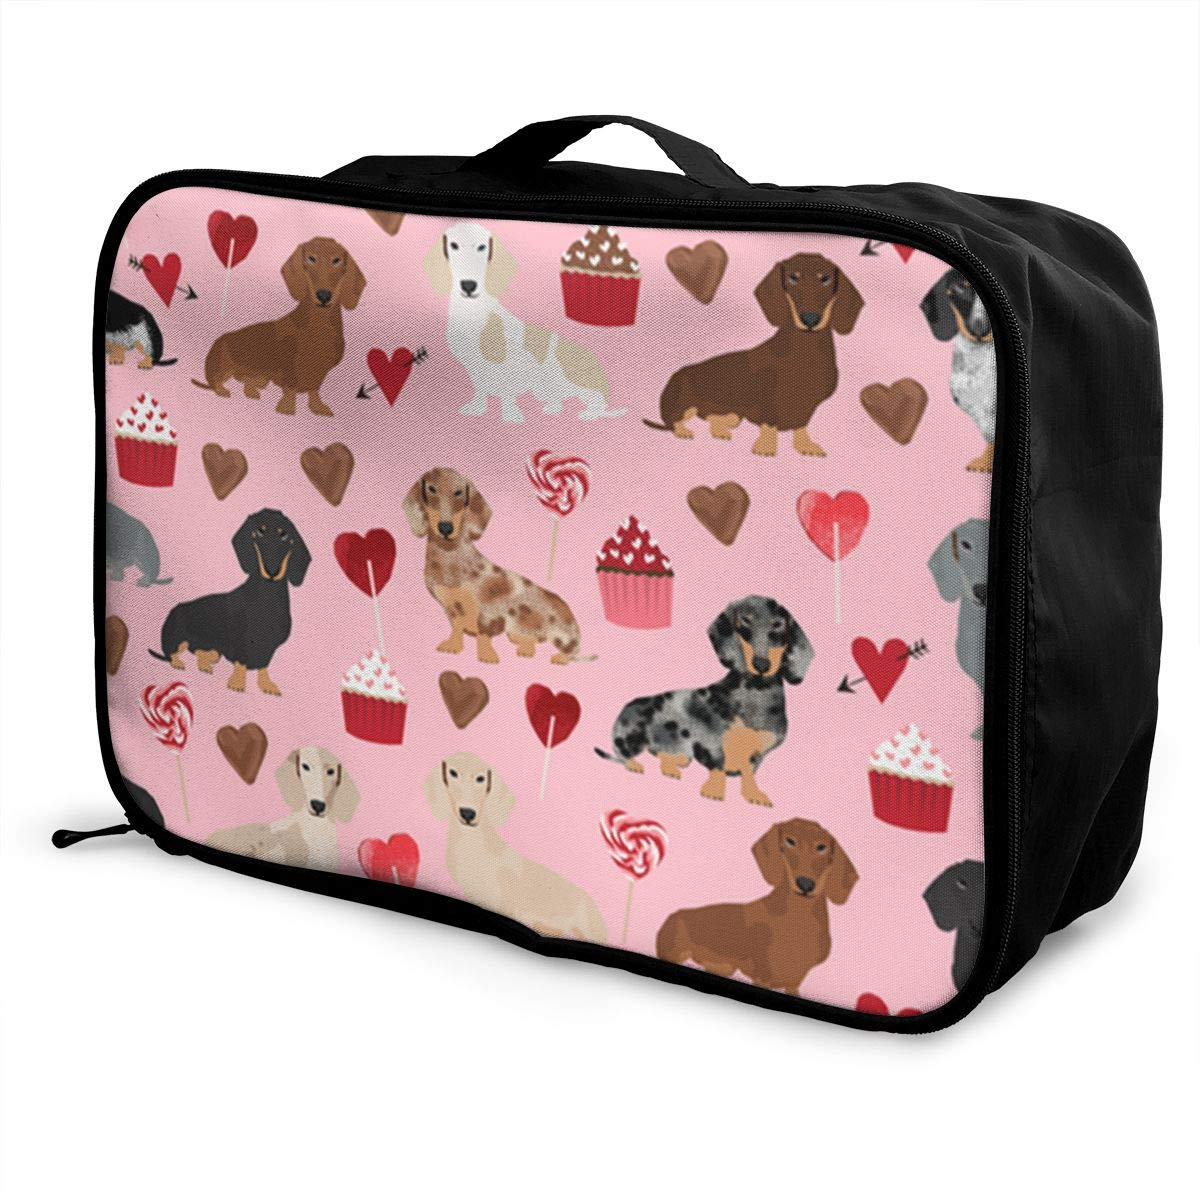 ADGAI Pink Cake Dachshund Canvas Travel Weekender Bag,Fashion Custom Lightweight Large Capacity Portable Luggage Bag,Suitcase Trolley Bag